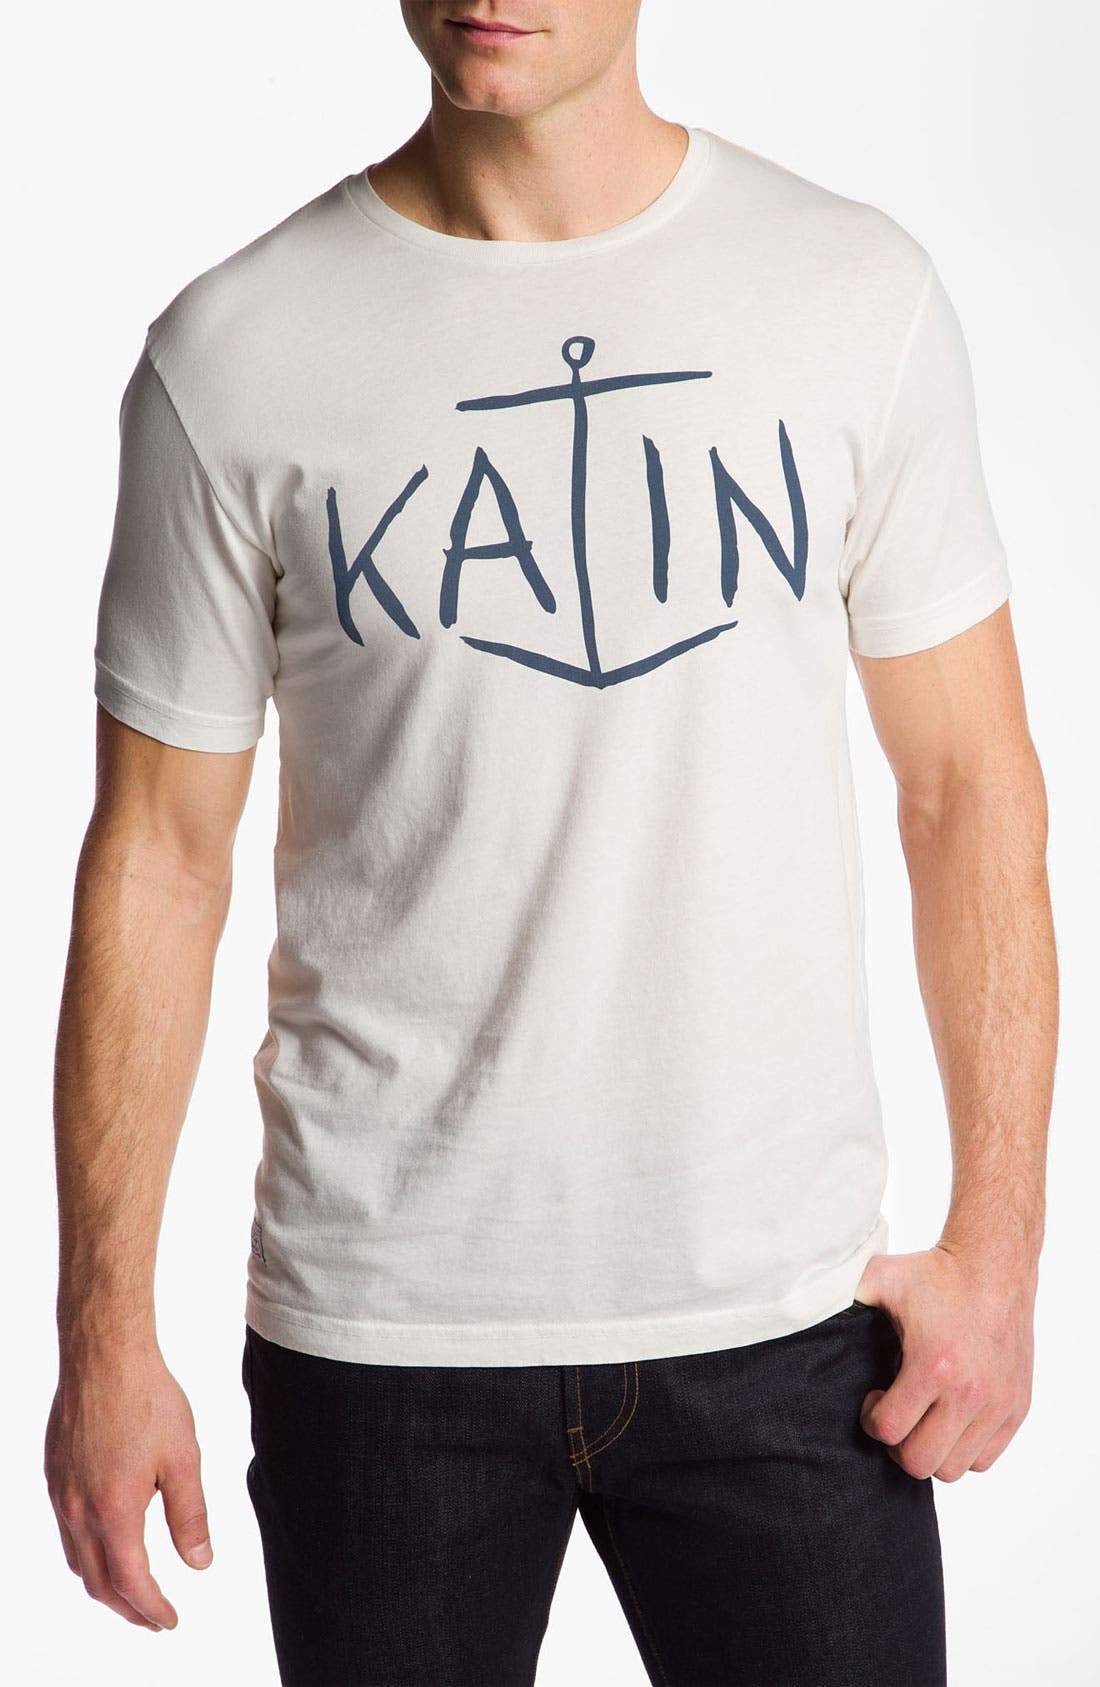 Main Image - Katin 'Tanker' T-Shirt